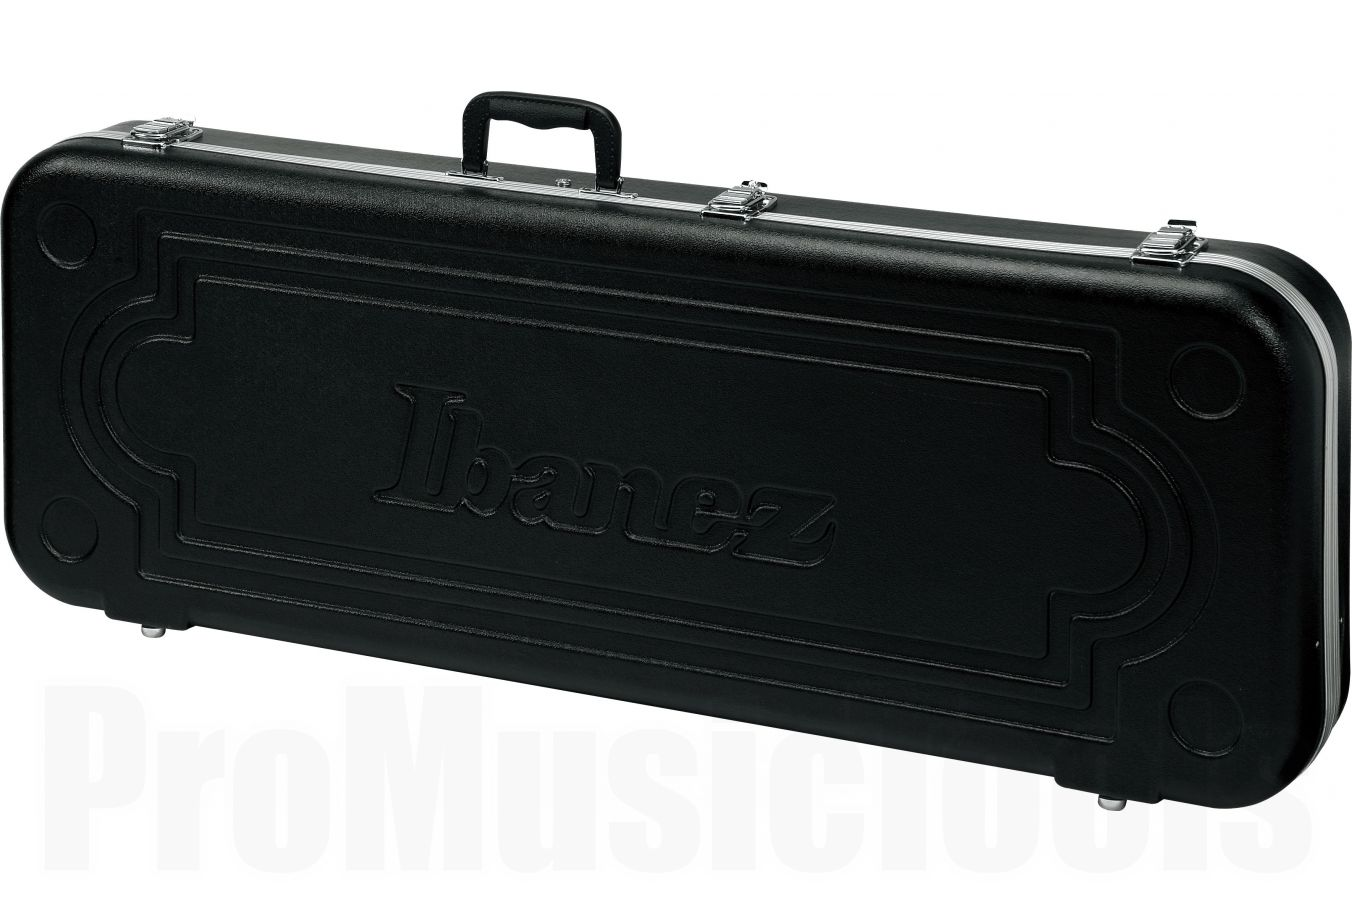 Ibanez M20JS hardcase f. Joe Satriani signature electric guitars